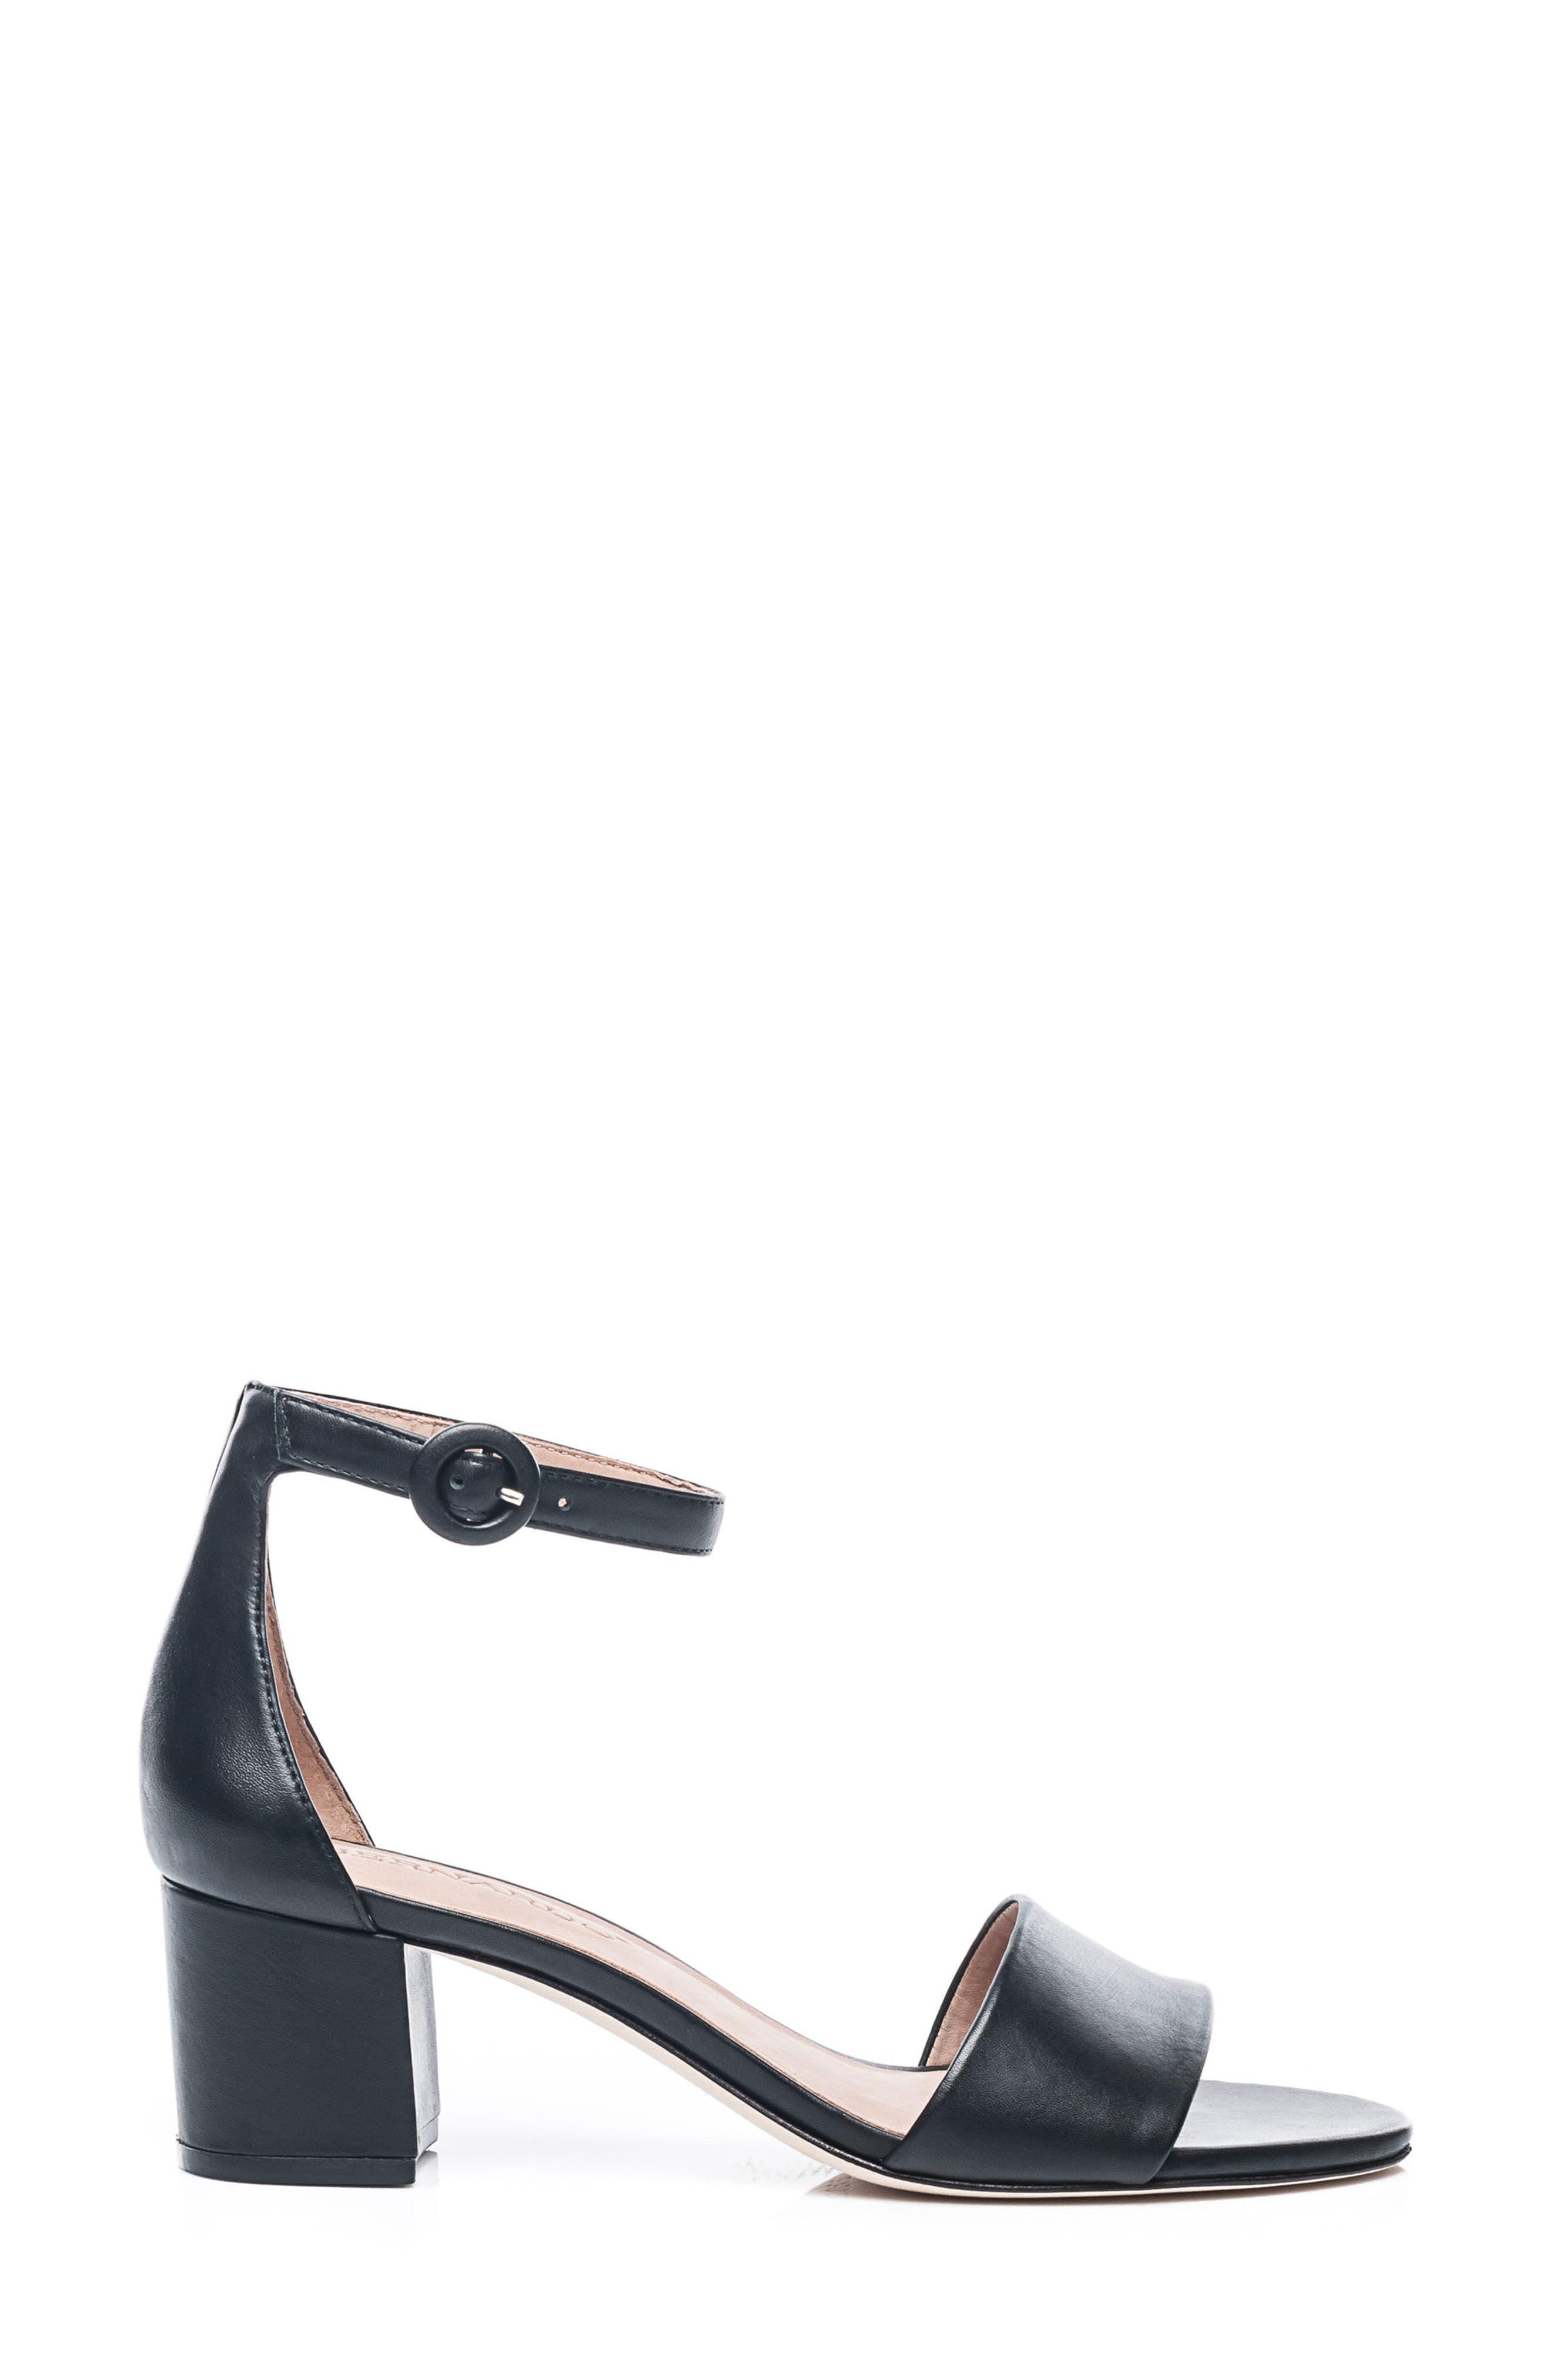 BERNARDO, Belinda Ankle Strap Sandal, Alternate thumbnail 3, color, BLACK LEATHER